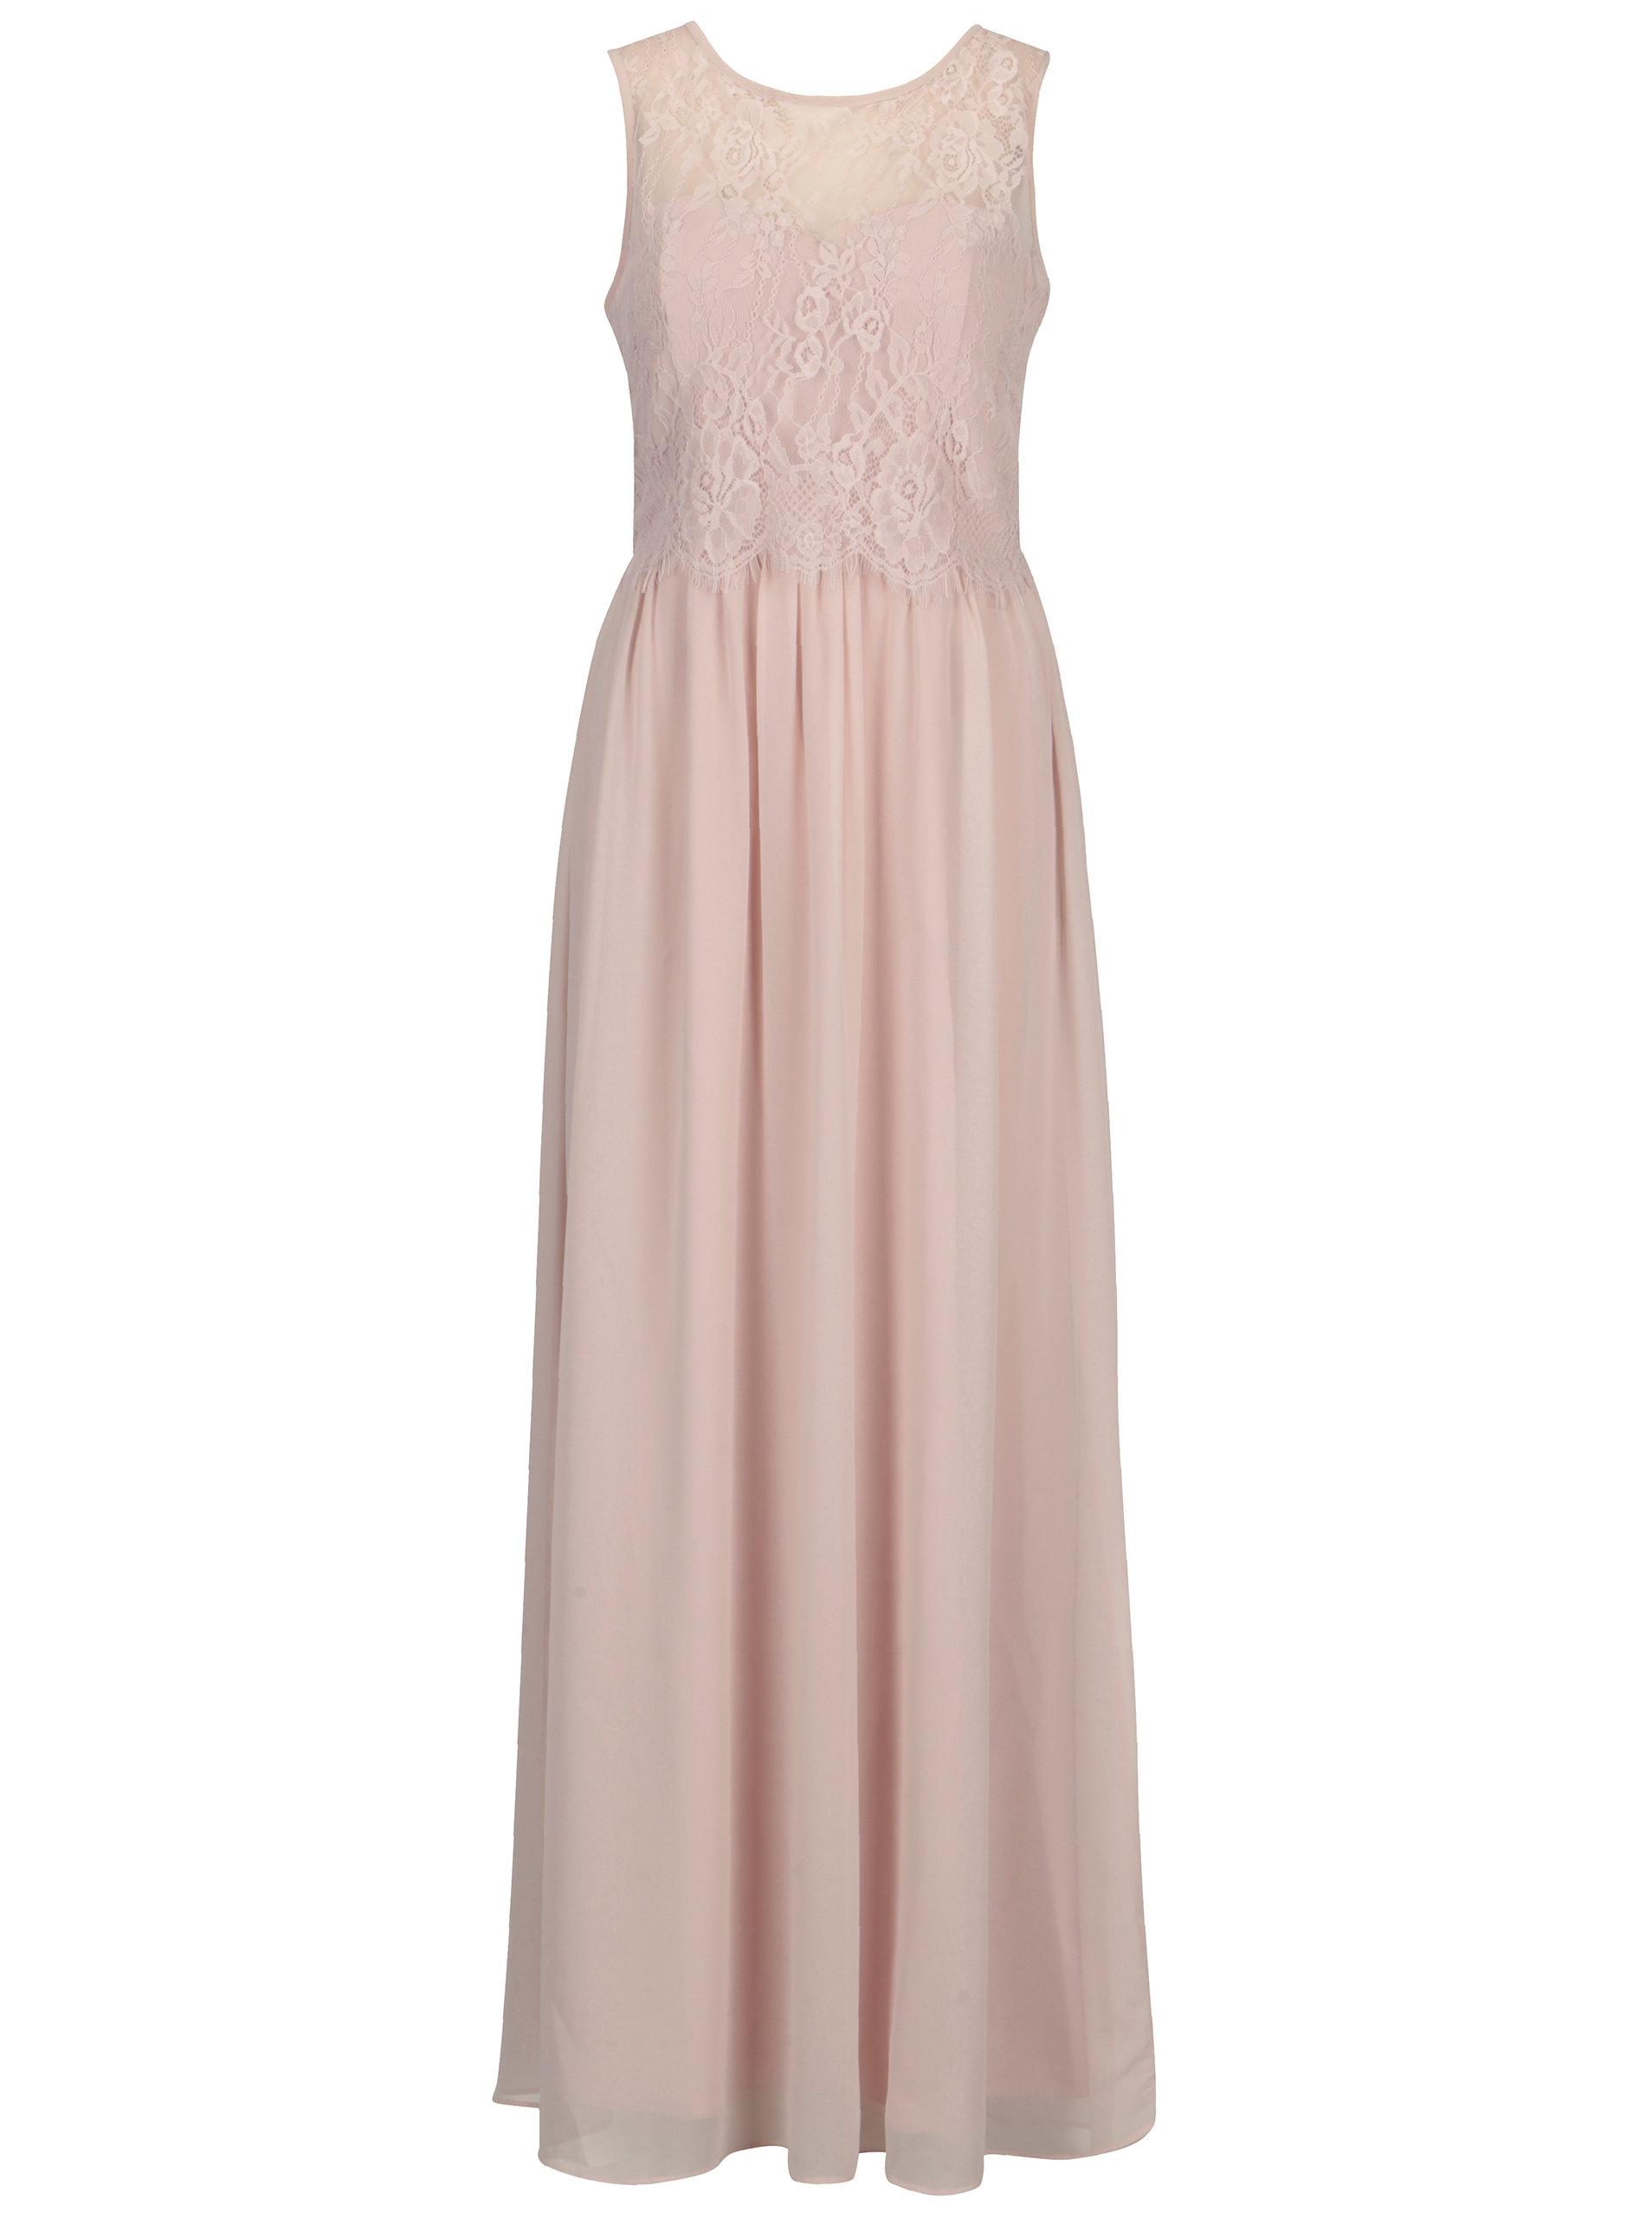 Světle růžové maxišaty s krajkovým topem Dorothy Perkins ... 4bbcaf59ef